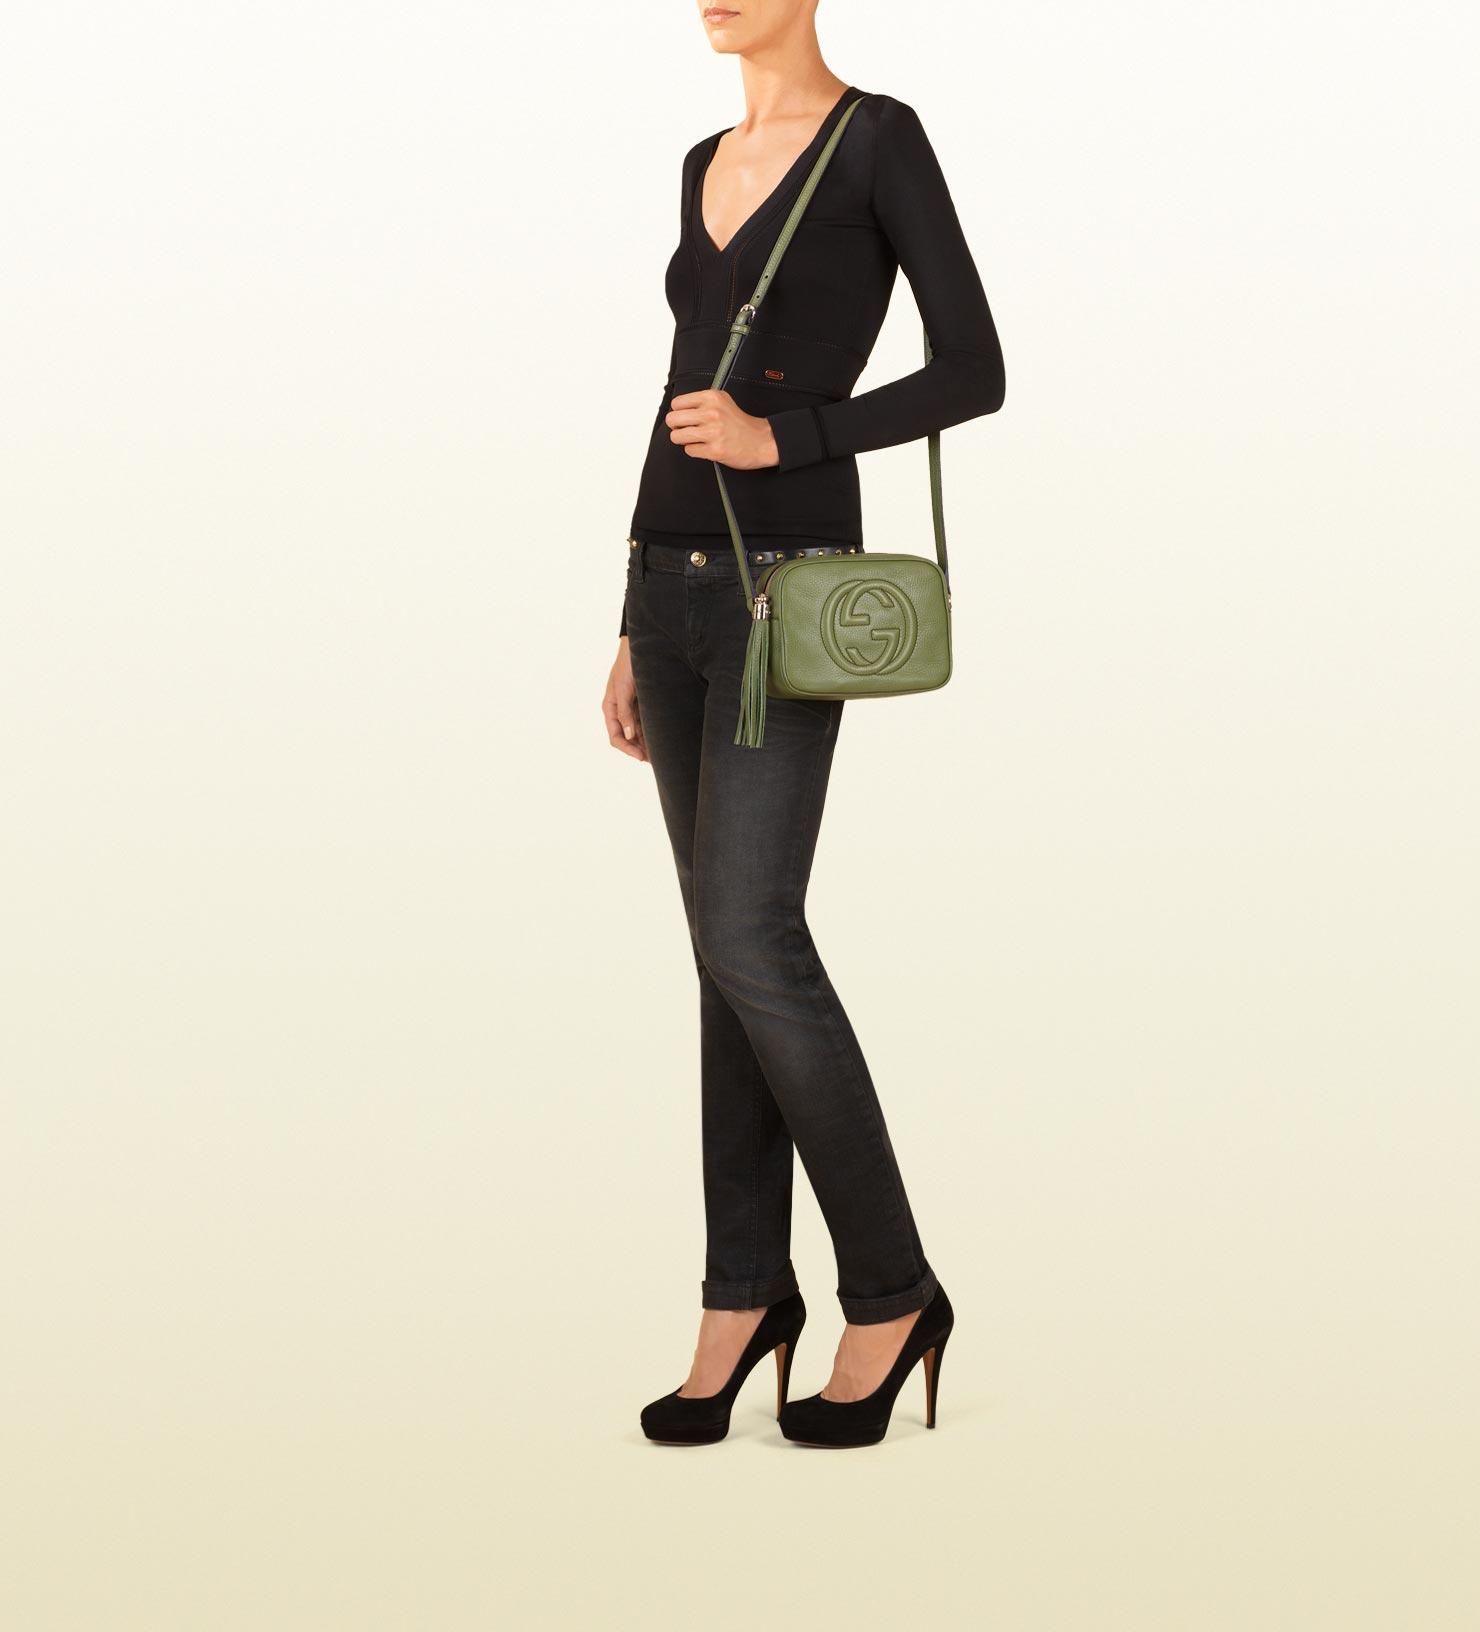 13c210793b1a Gucci Soho Green Leather Disco Bag in Green - Lyst